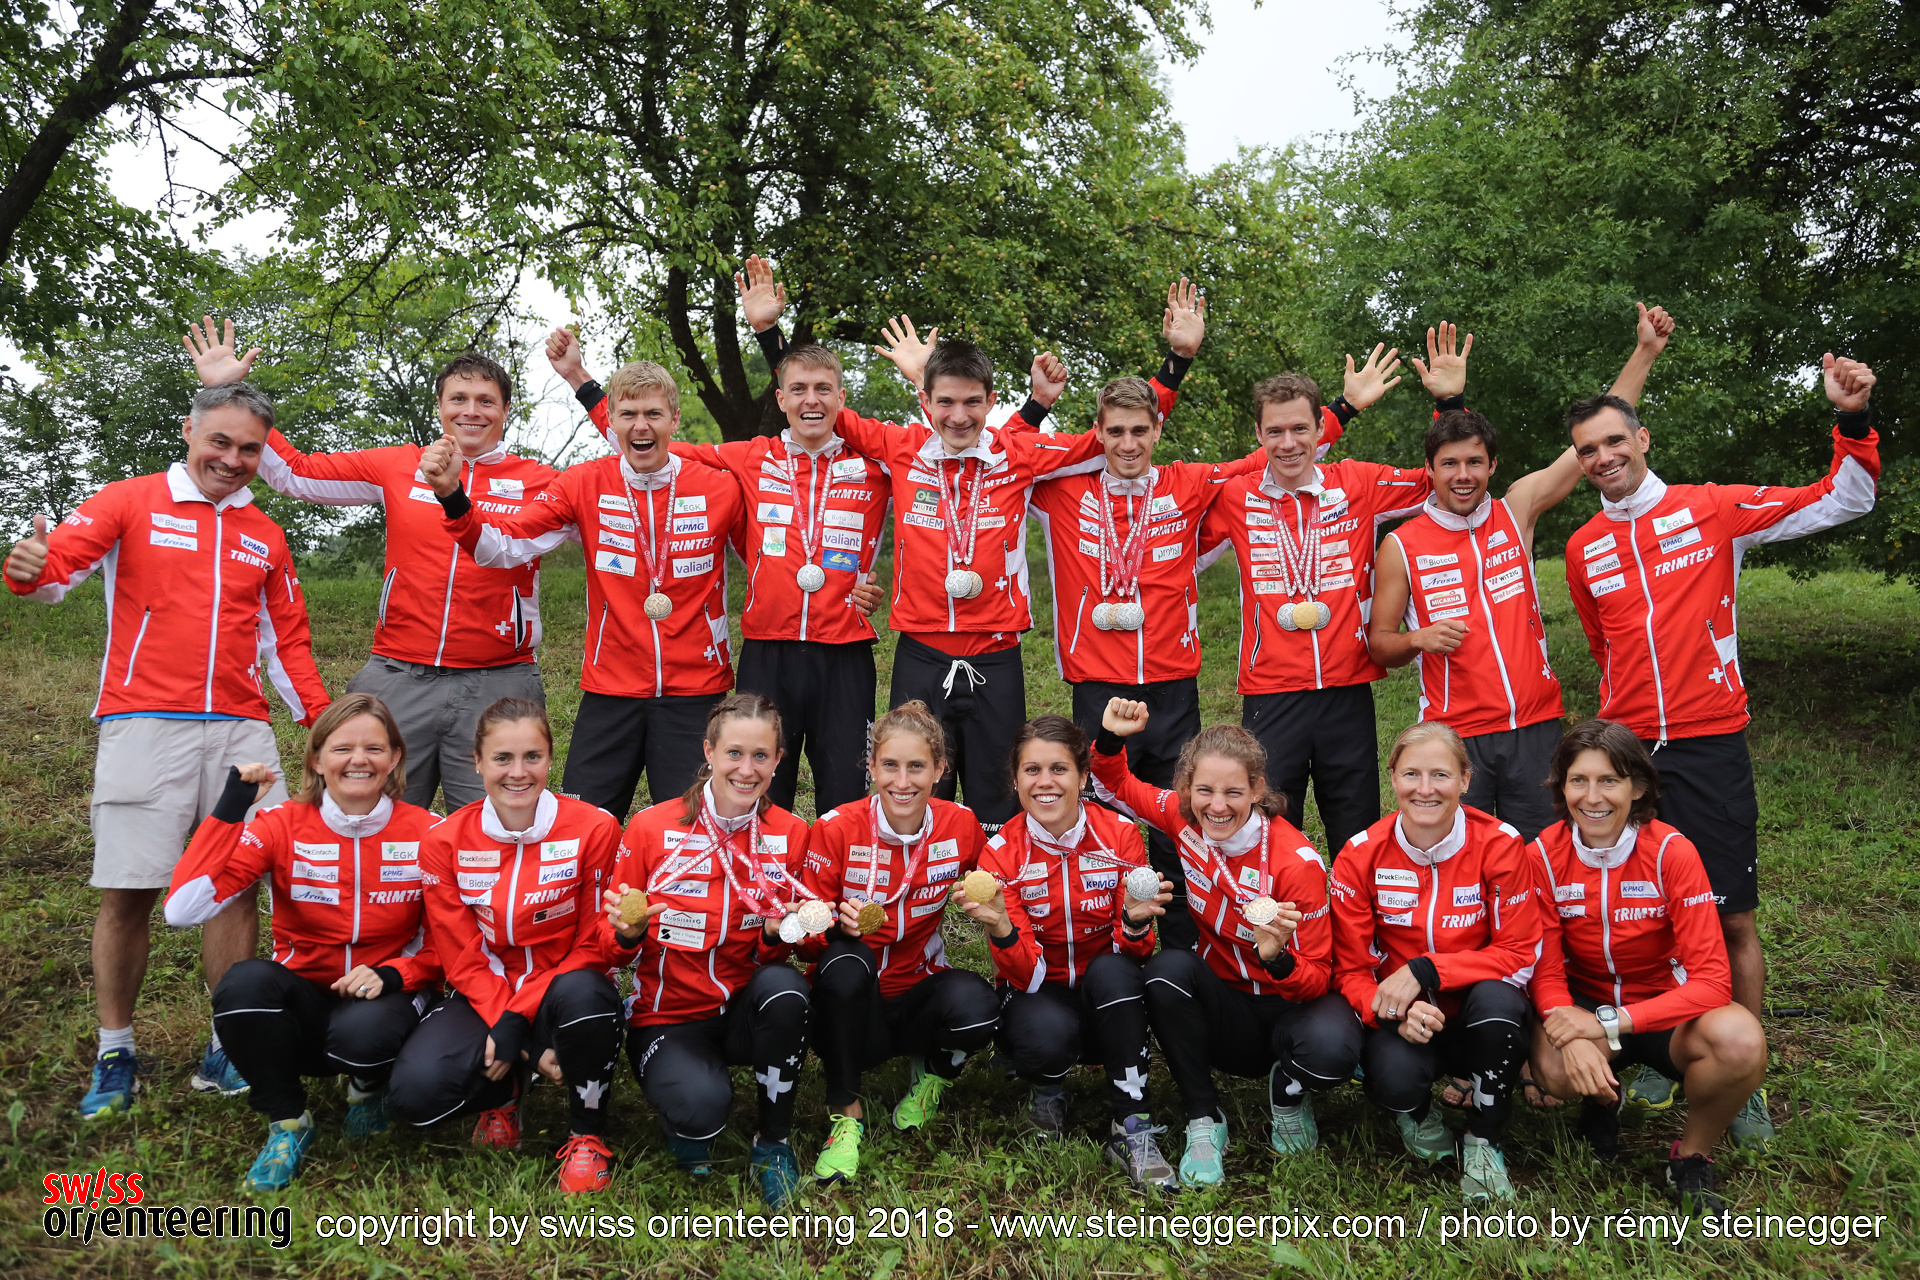 The Swiss Orienteering Team at WOC 2018 Latvia